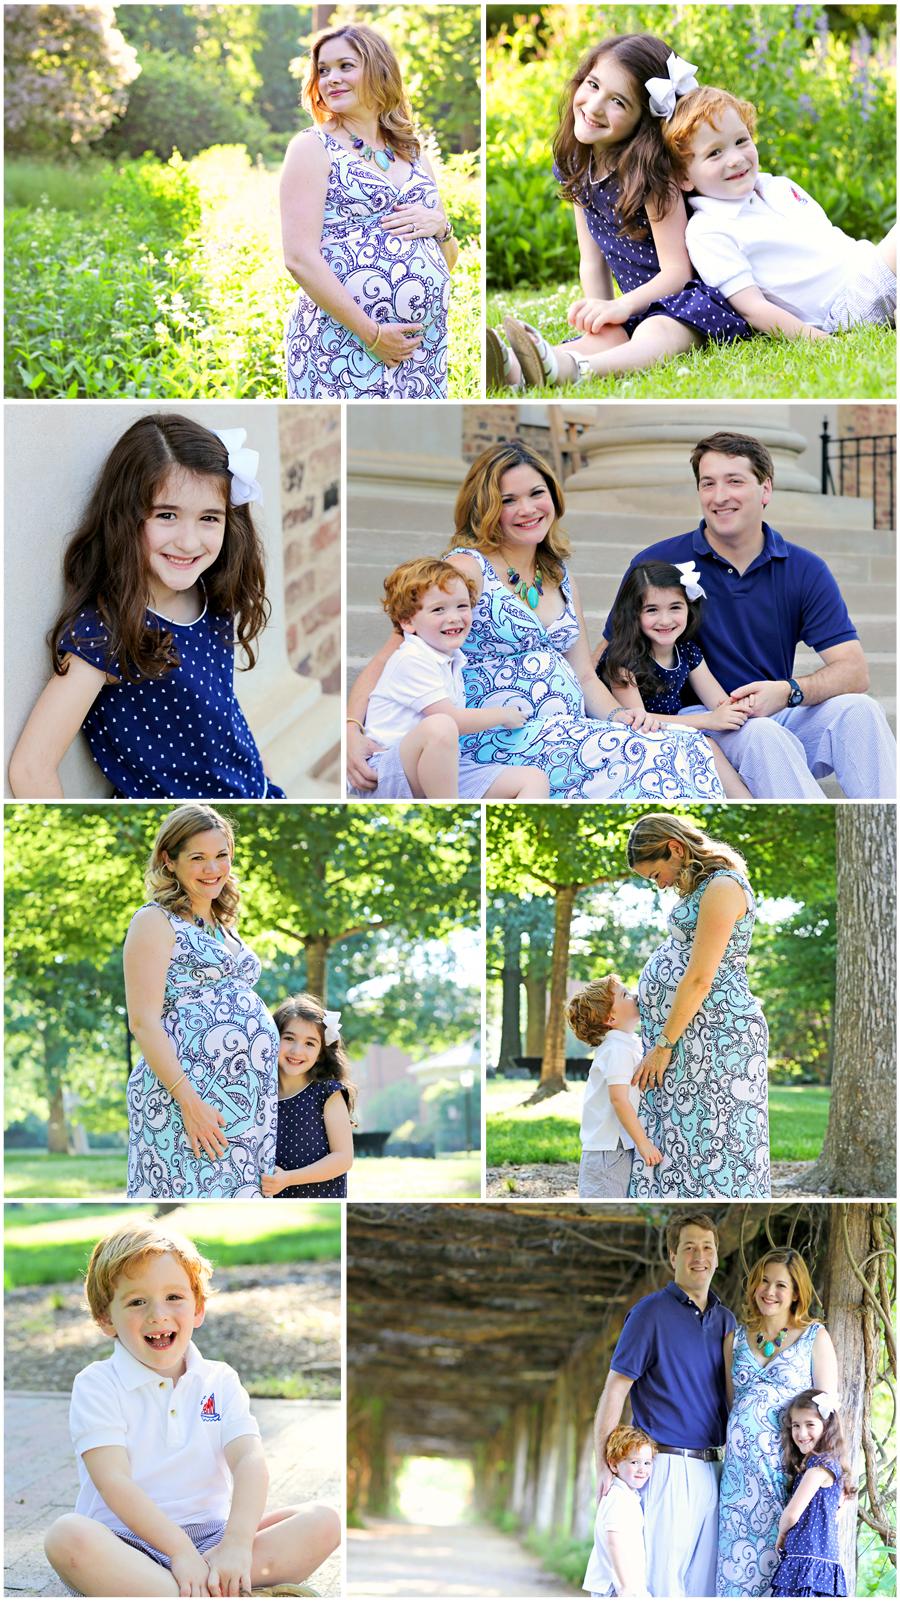 Magid Maternity